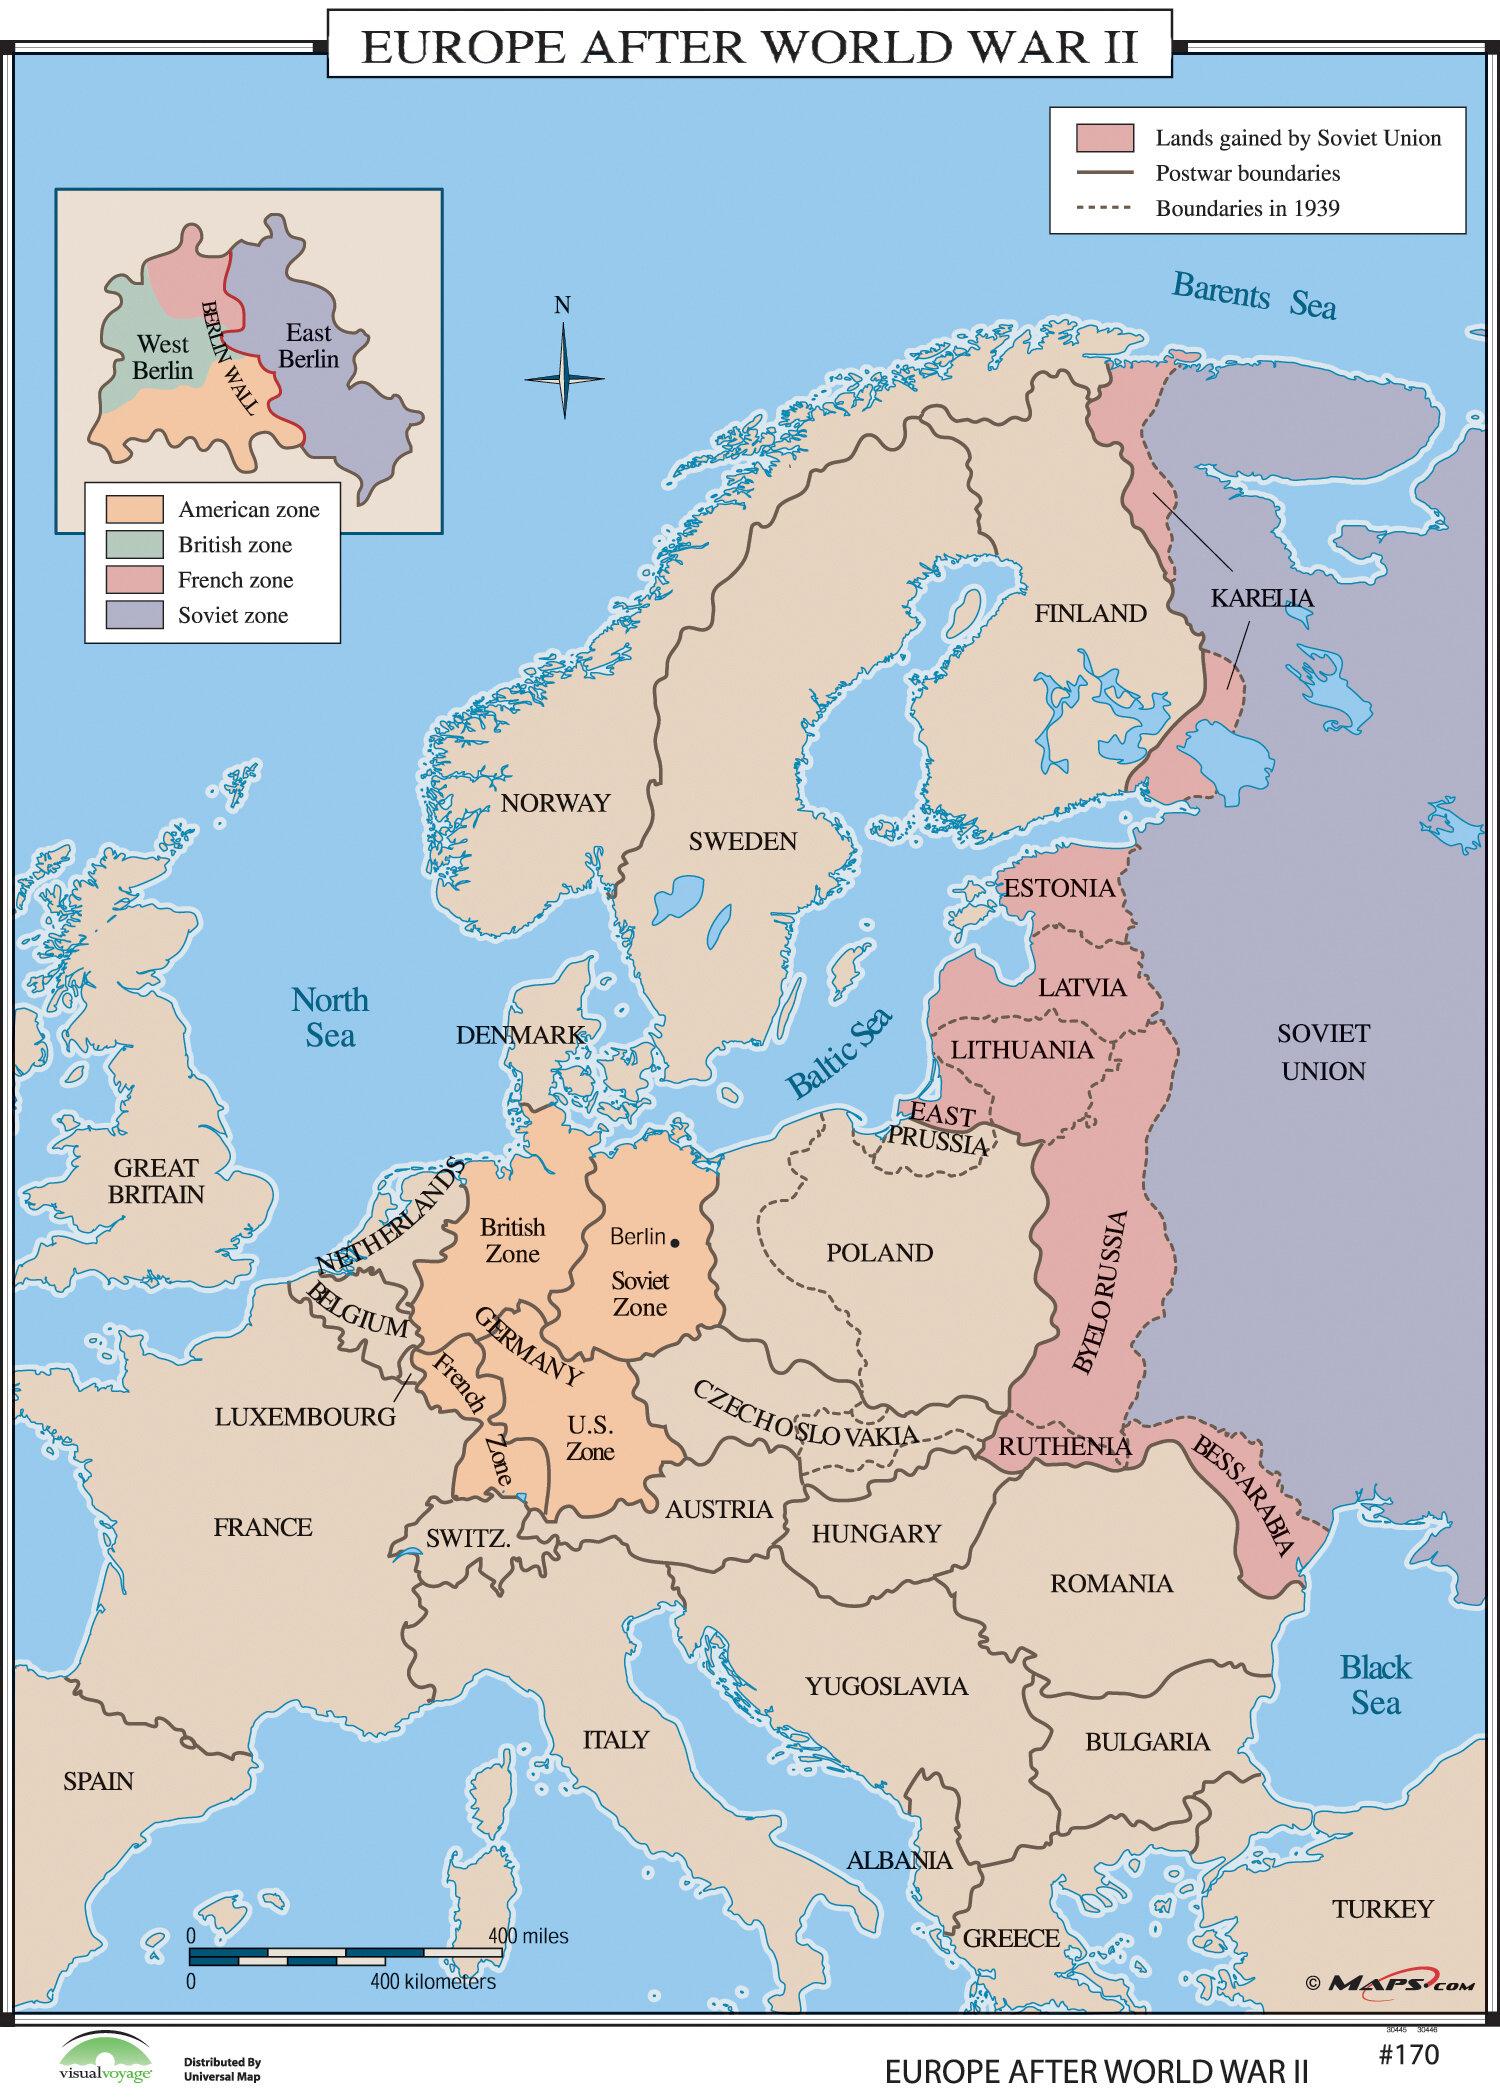 Wayfair | Universal Map World History Wall Maps - Europe after World ...